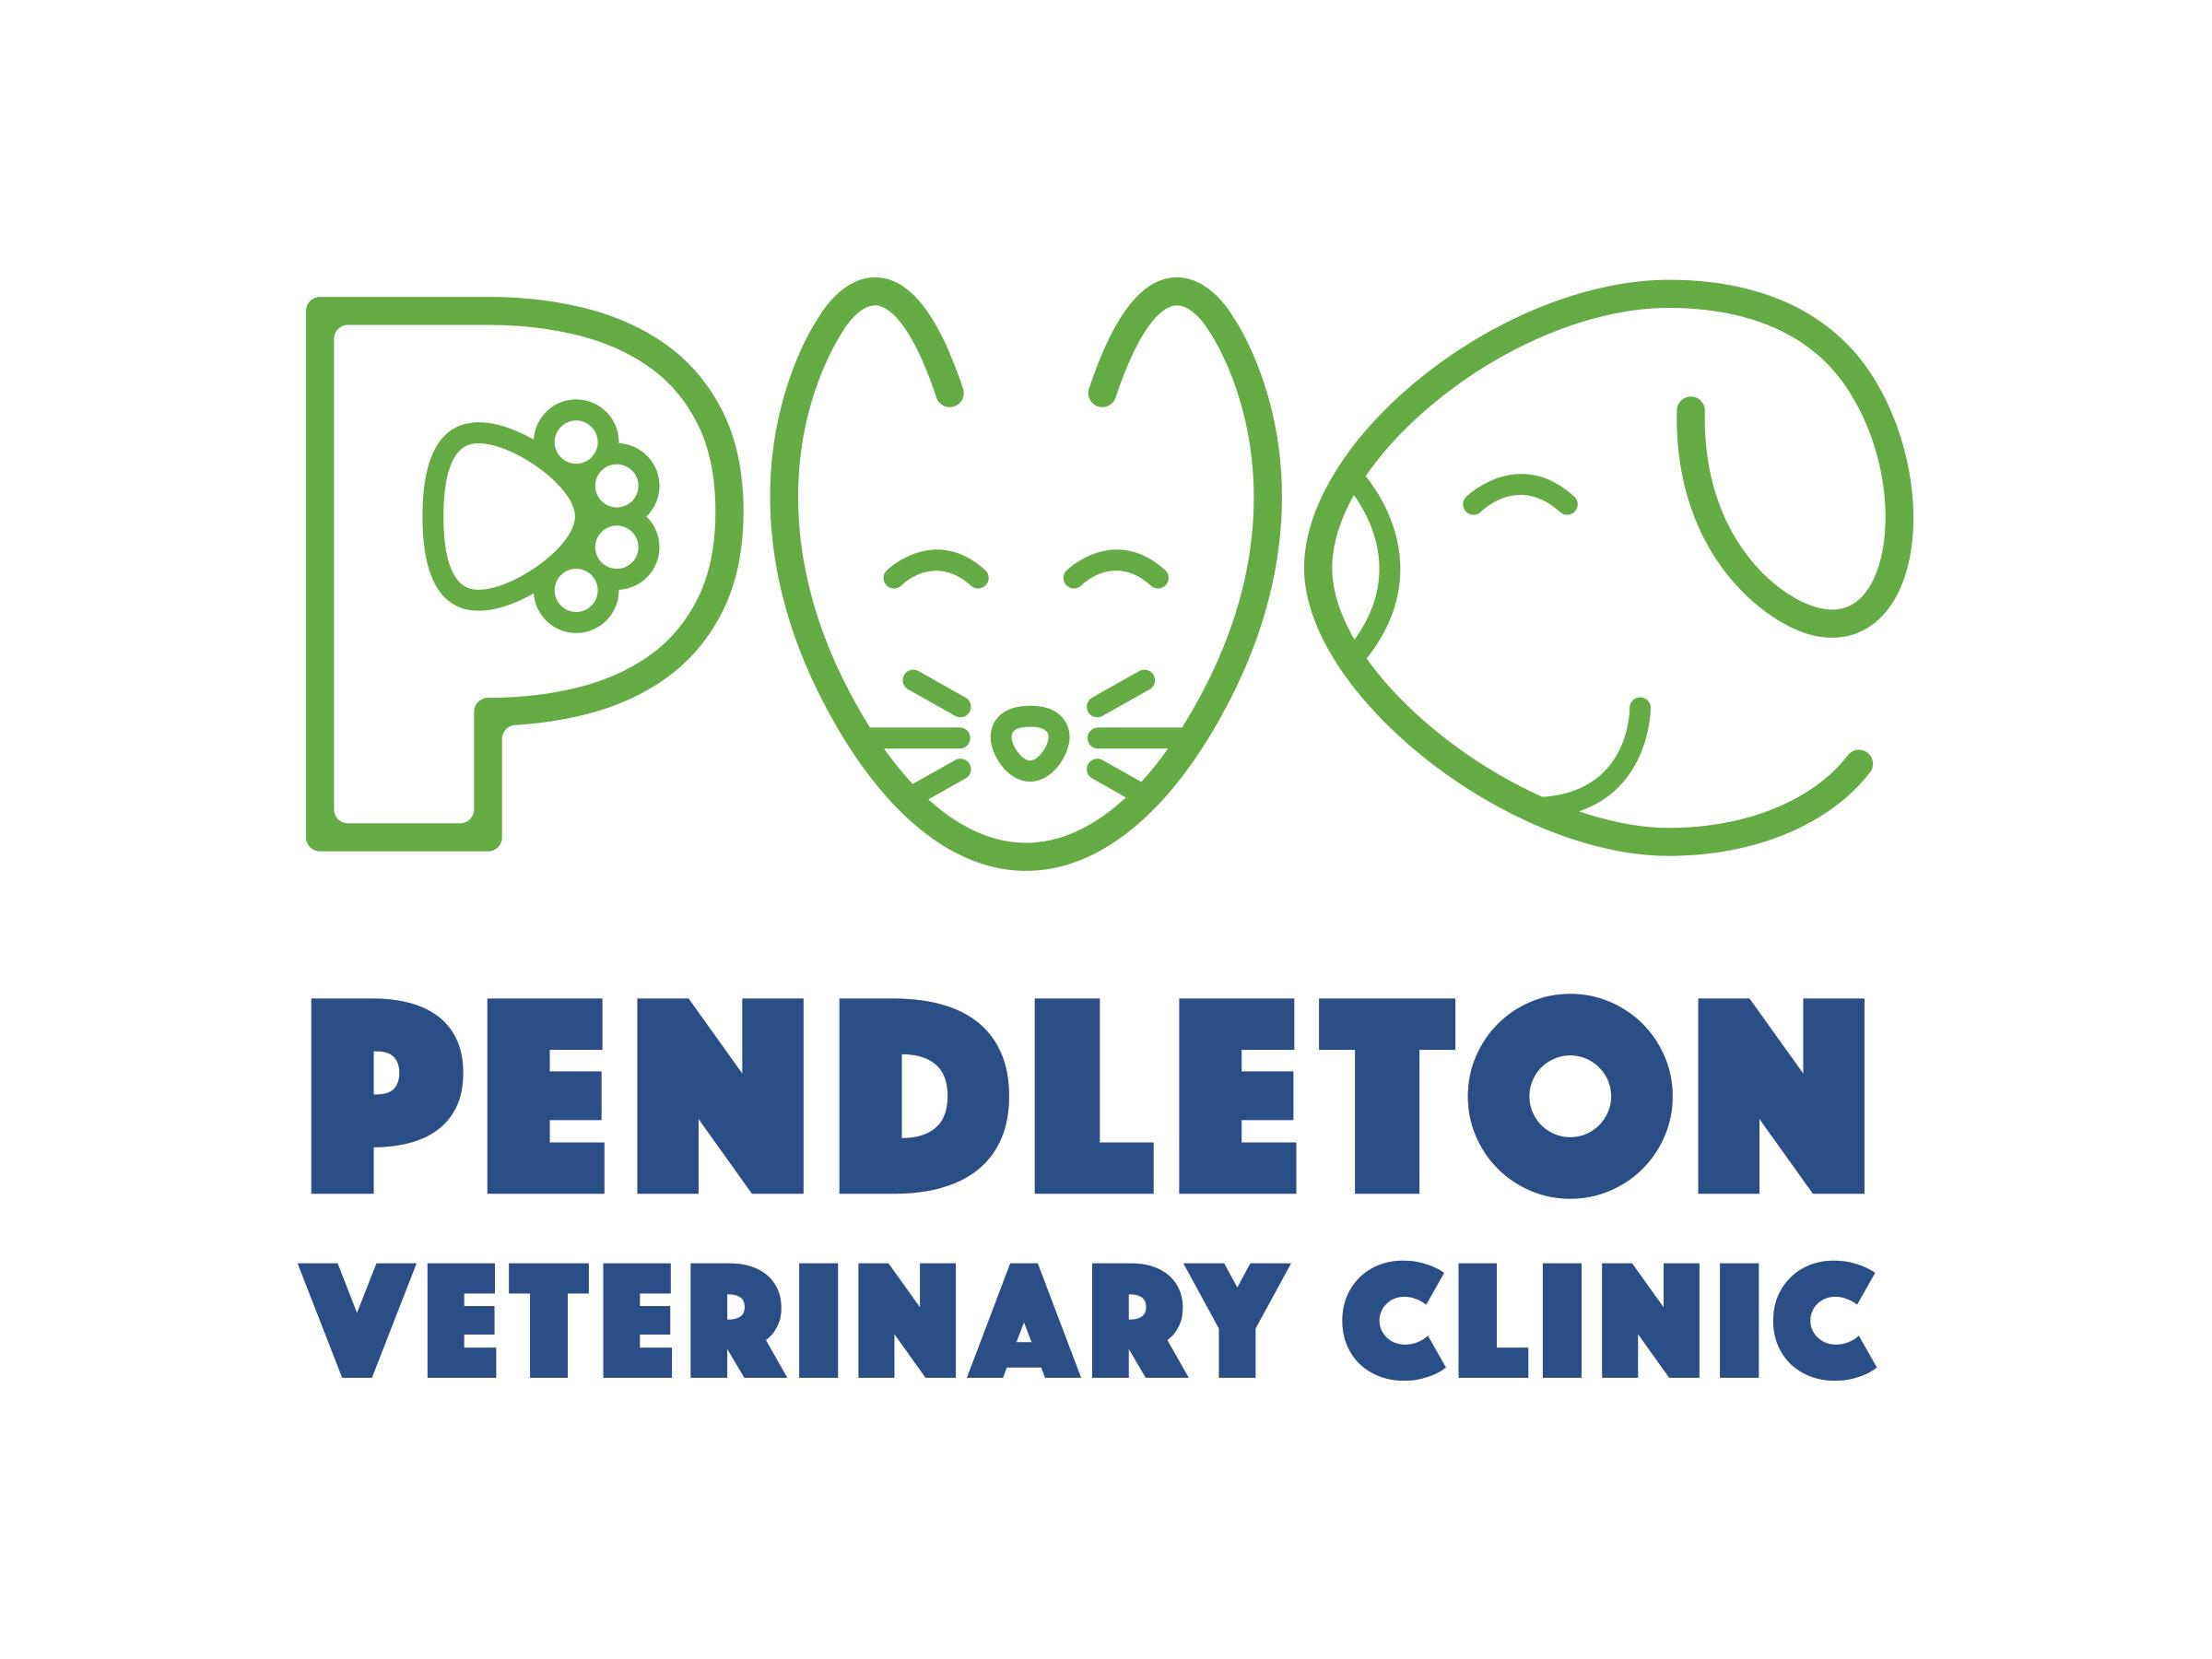 Pendleton Veterinary Clinic